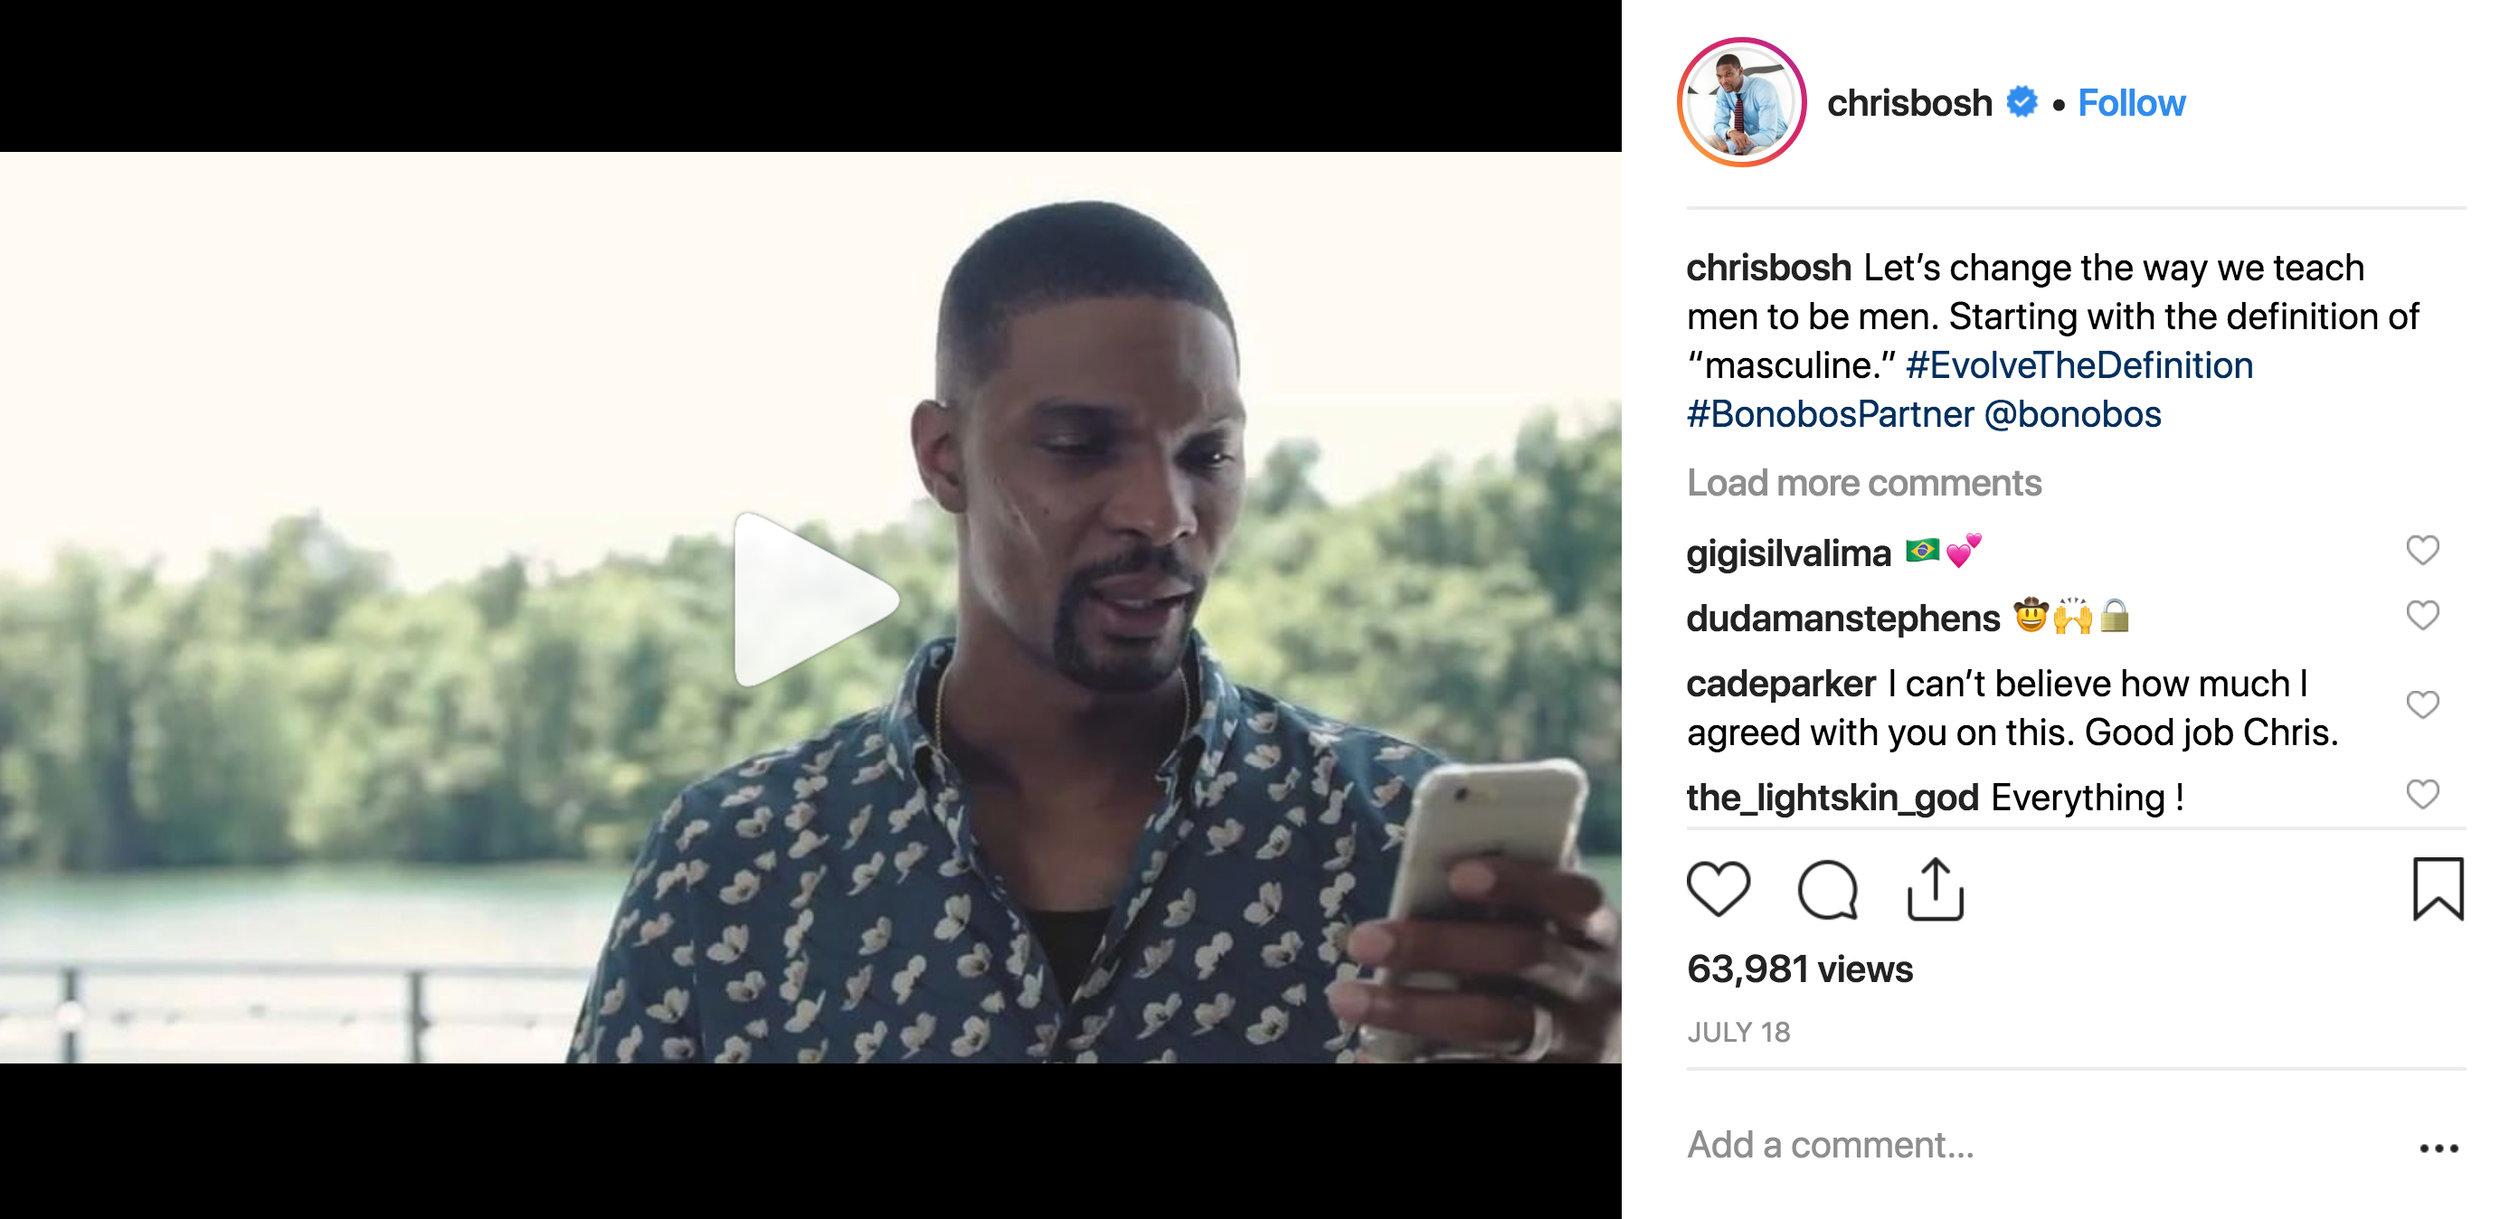 4_#EvolveTheDefinition_Influencer_Chris Bosh_Instagram.jpg